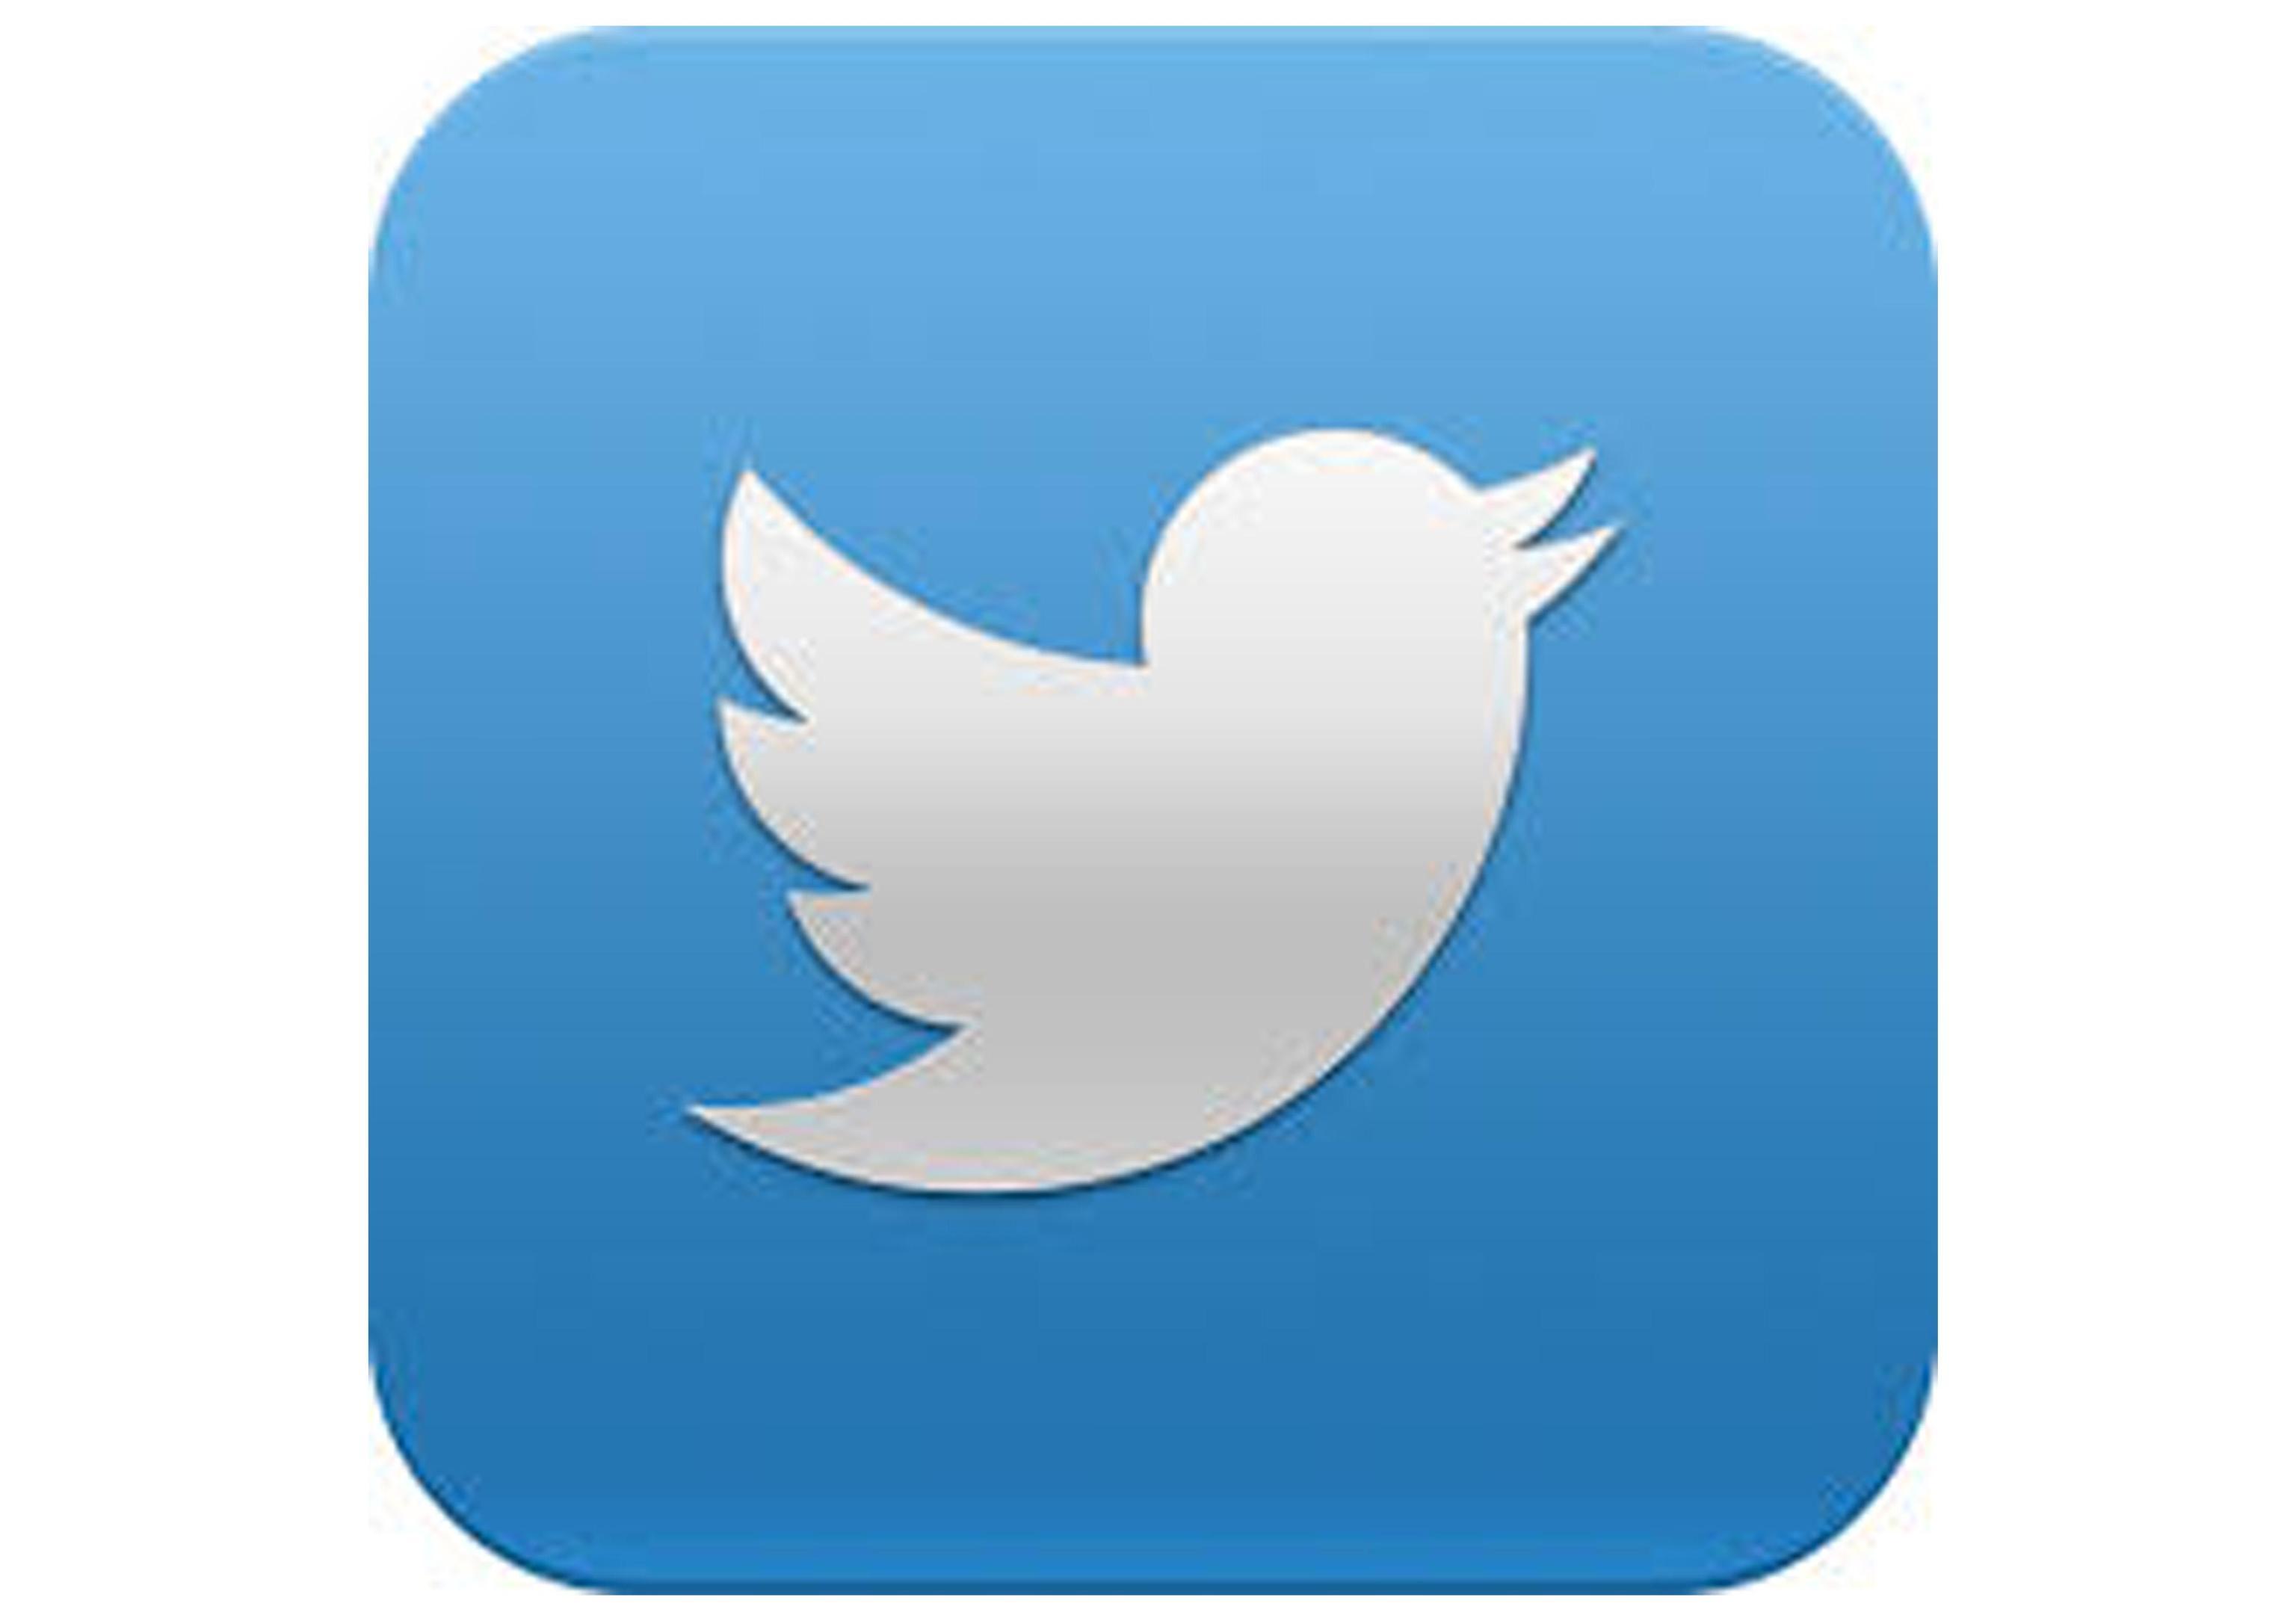 Twitter,messaggi passano a 280 caratteri